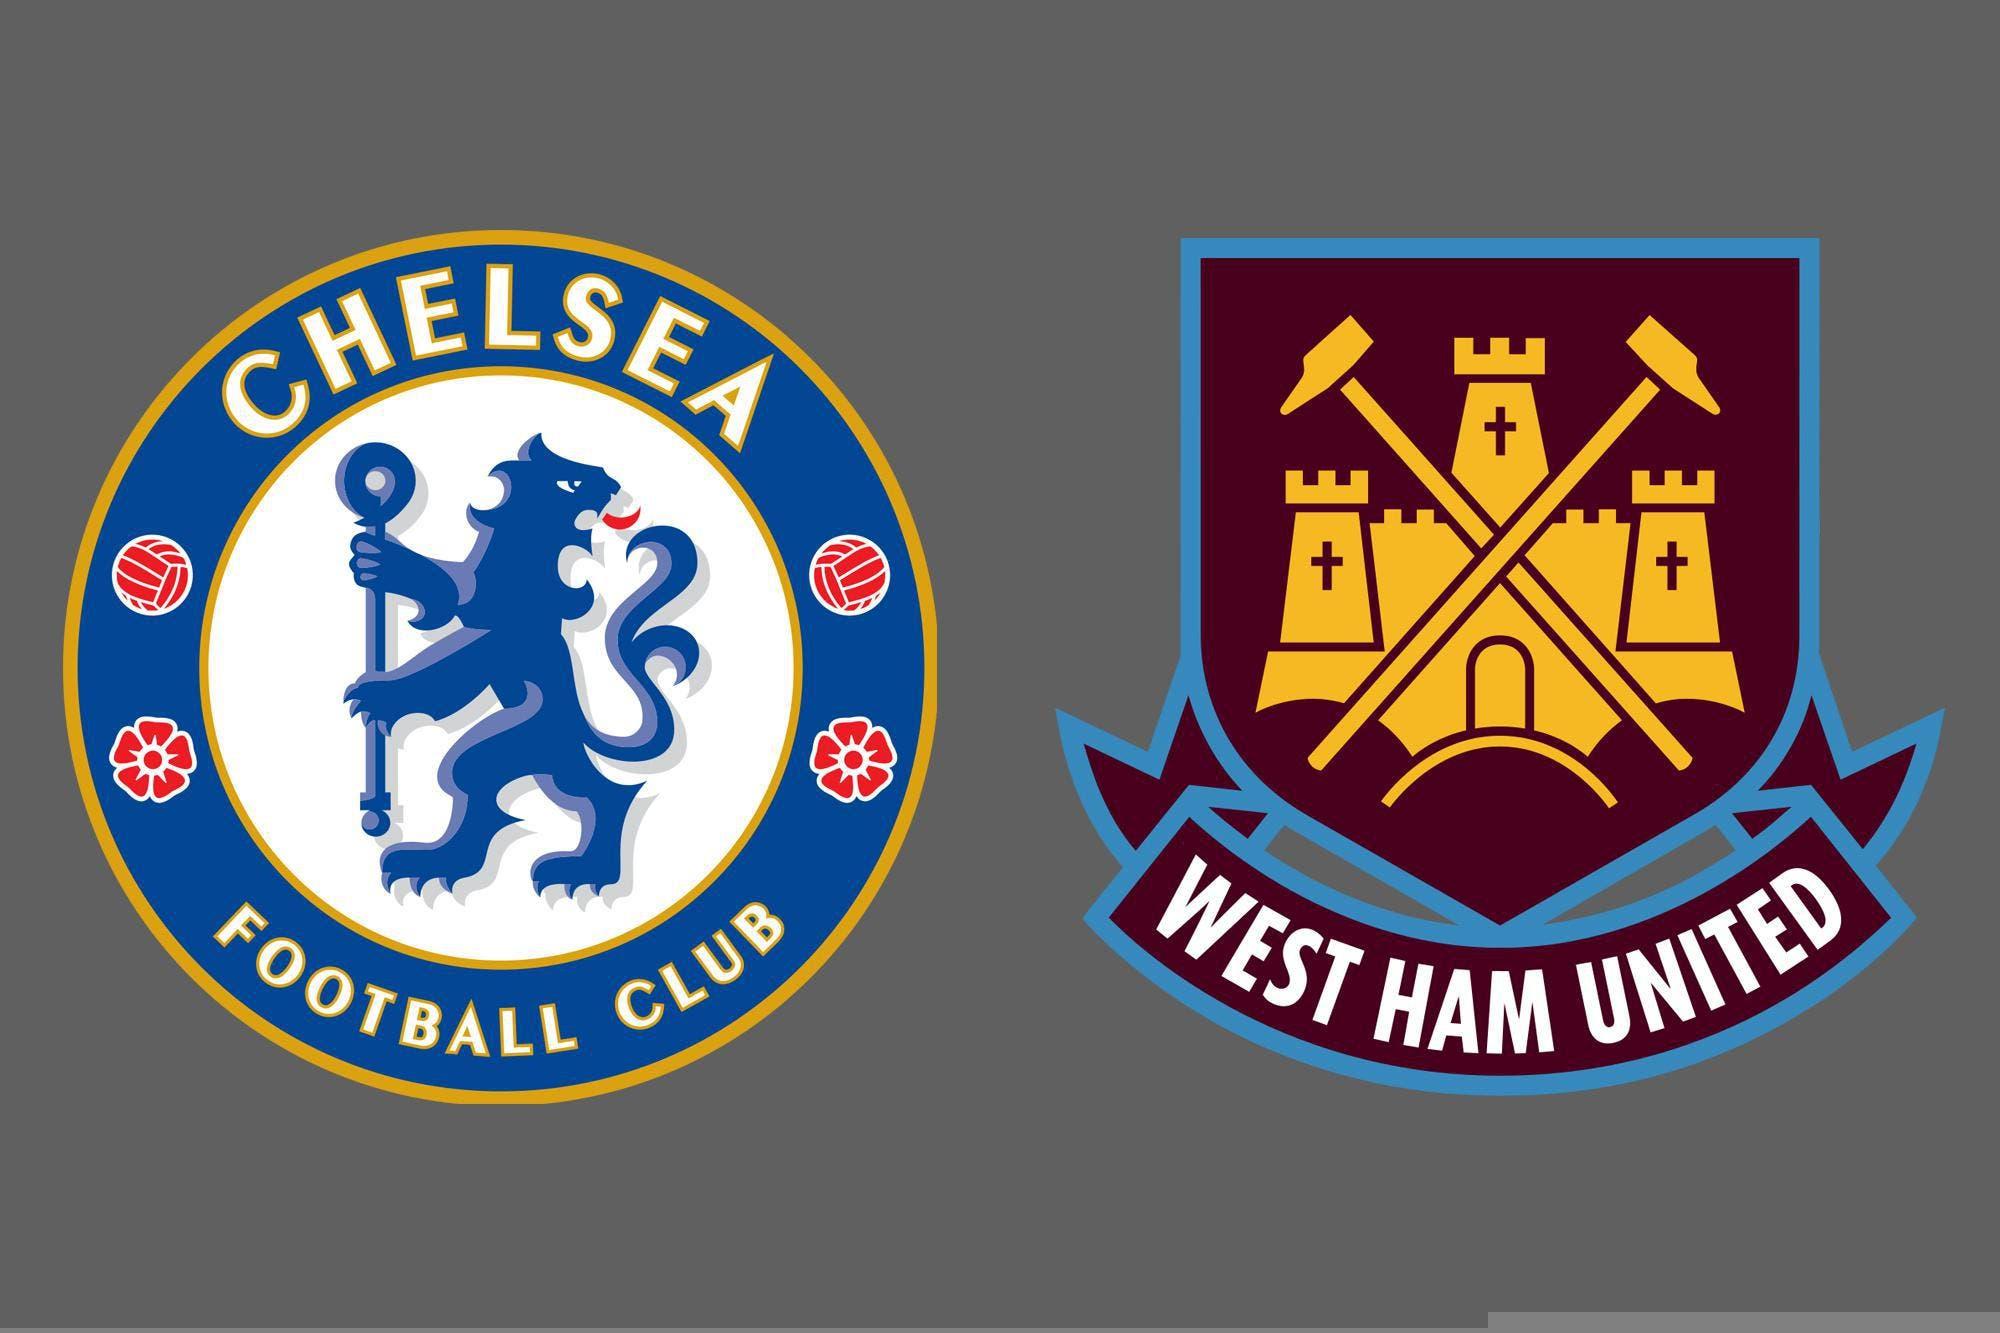 Premier League de Inglaterra: Chelsea venció por 3-0 a West Ham United como local